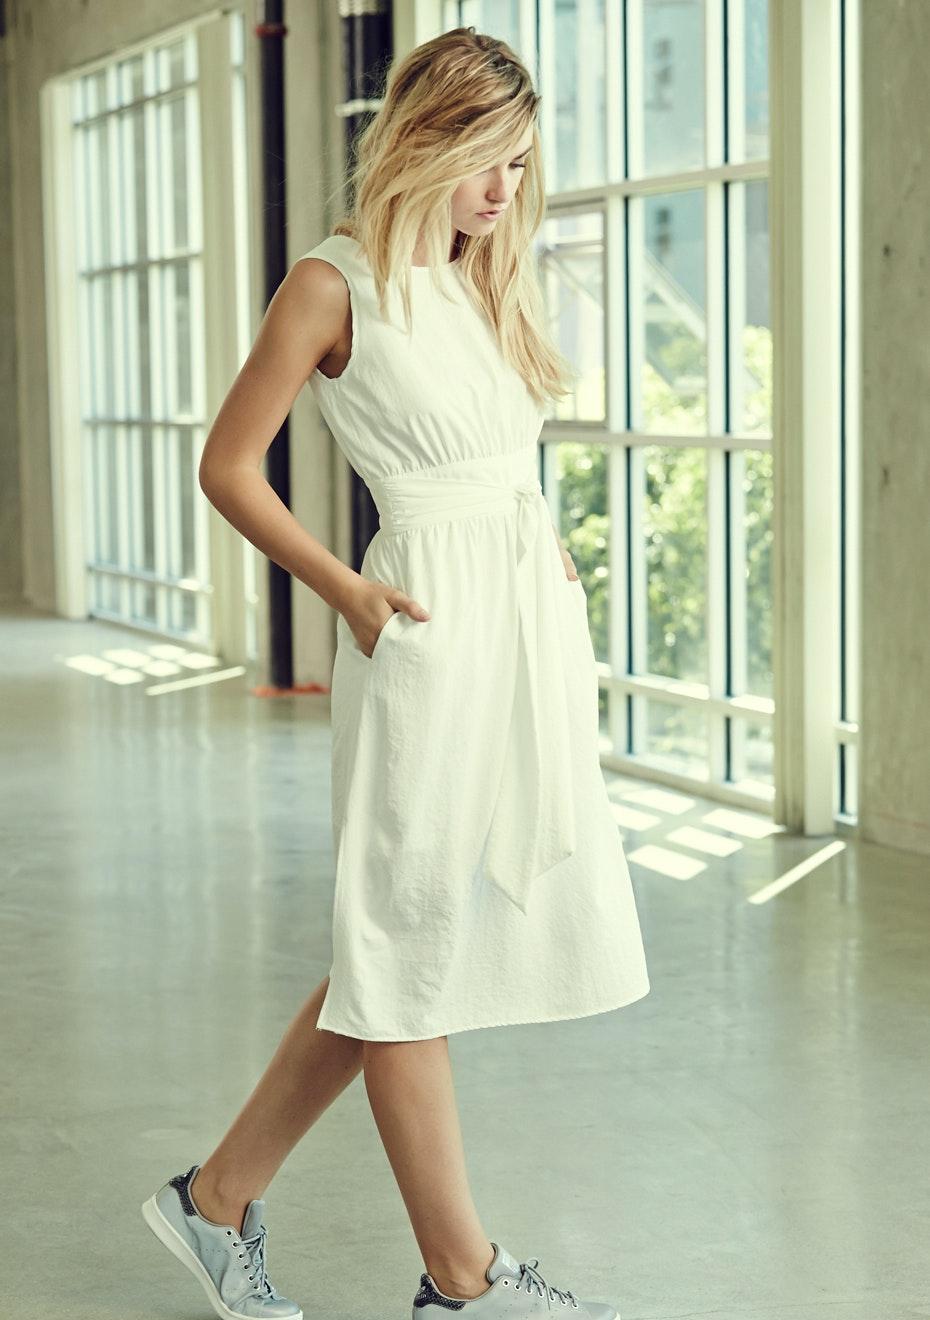 Achro - Wide Belted Dress - White